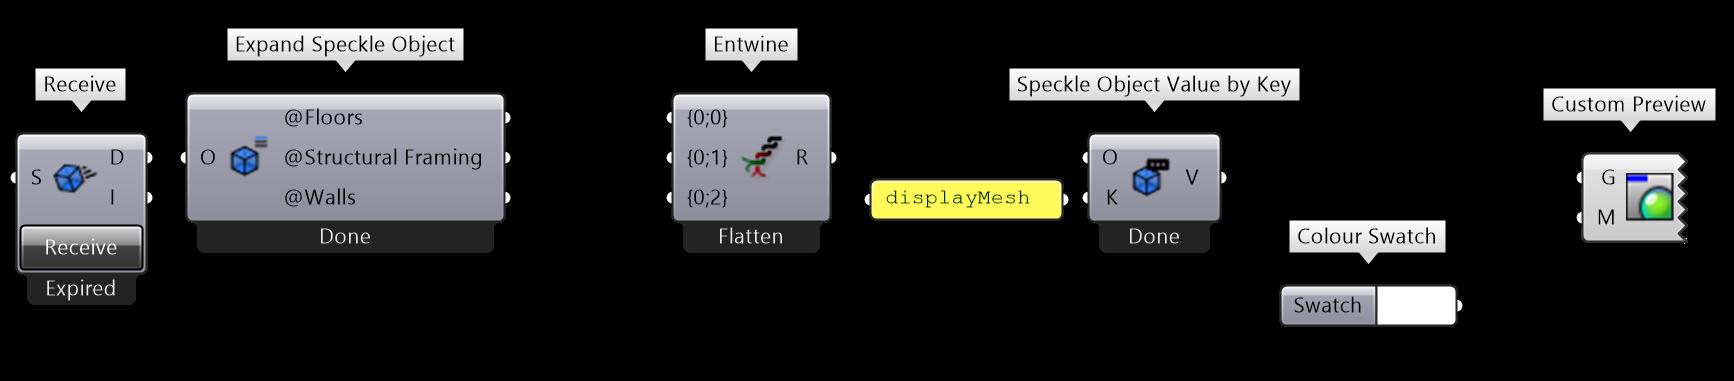 Get display mesh of element